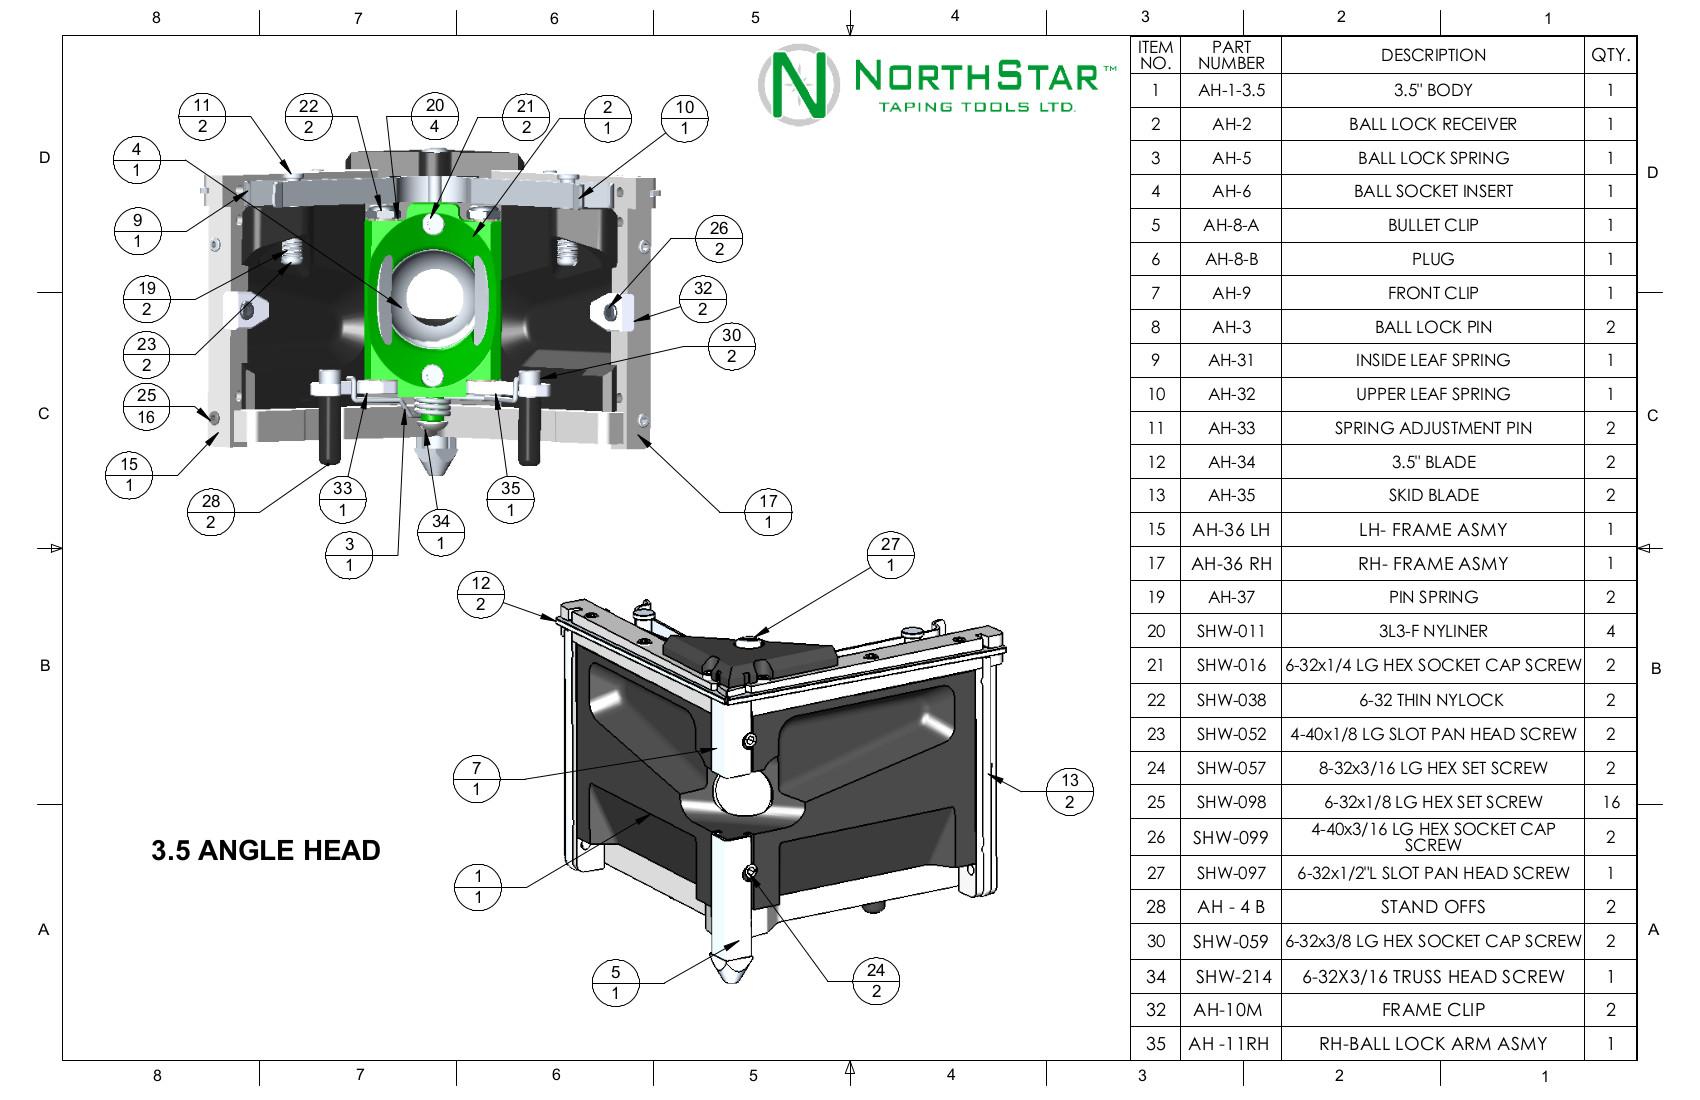 northstar angle head parts